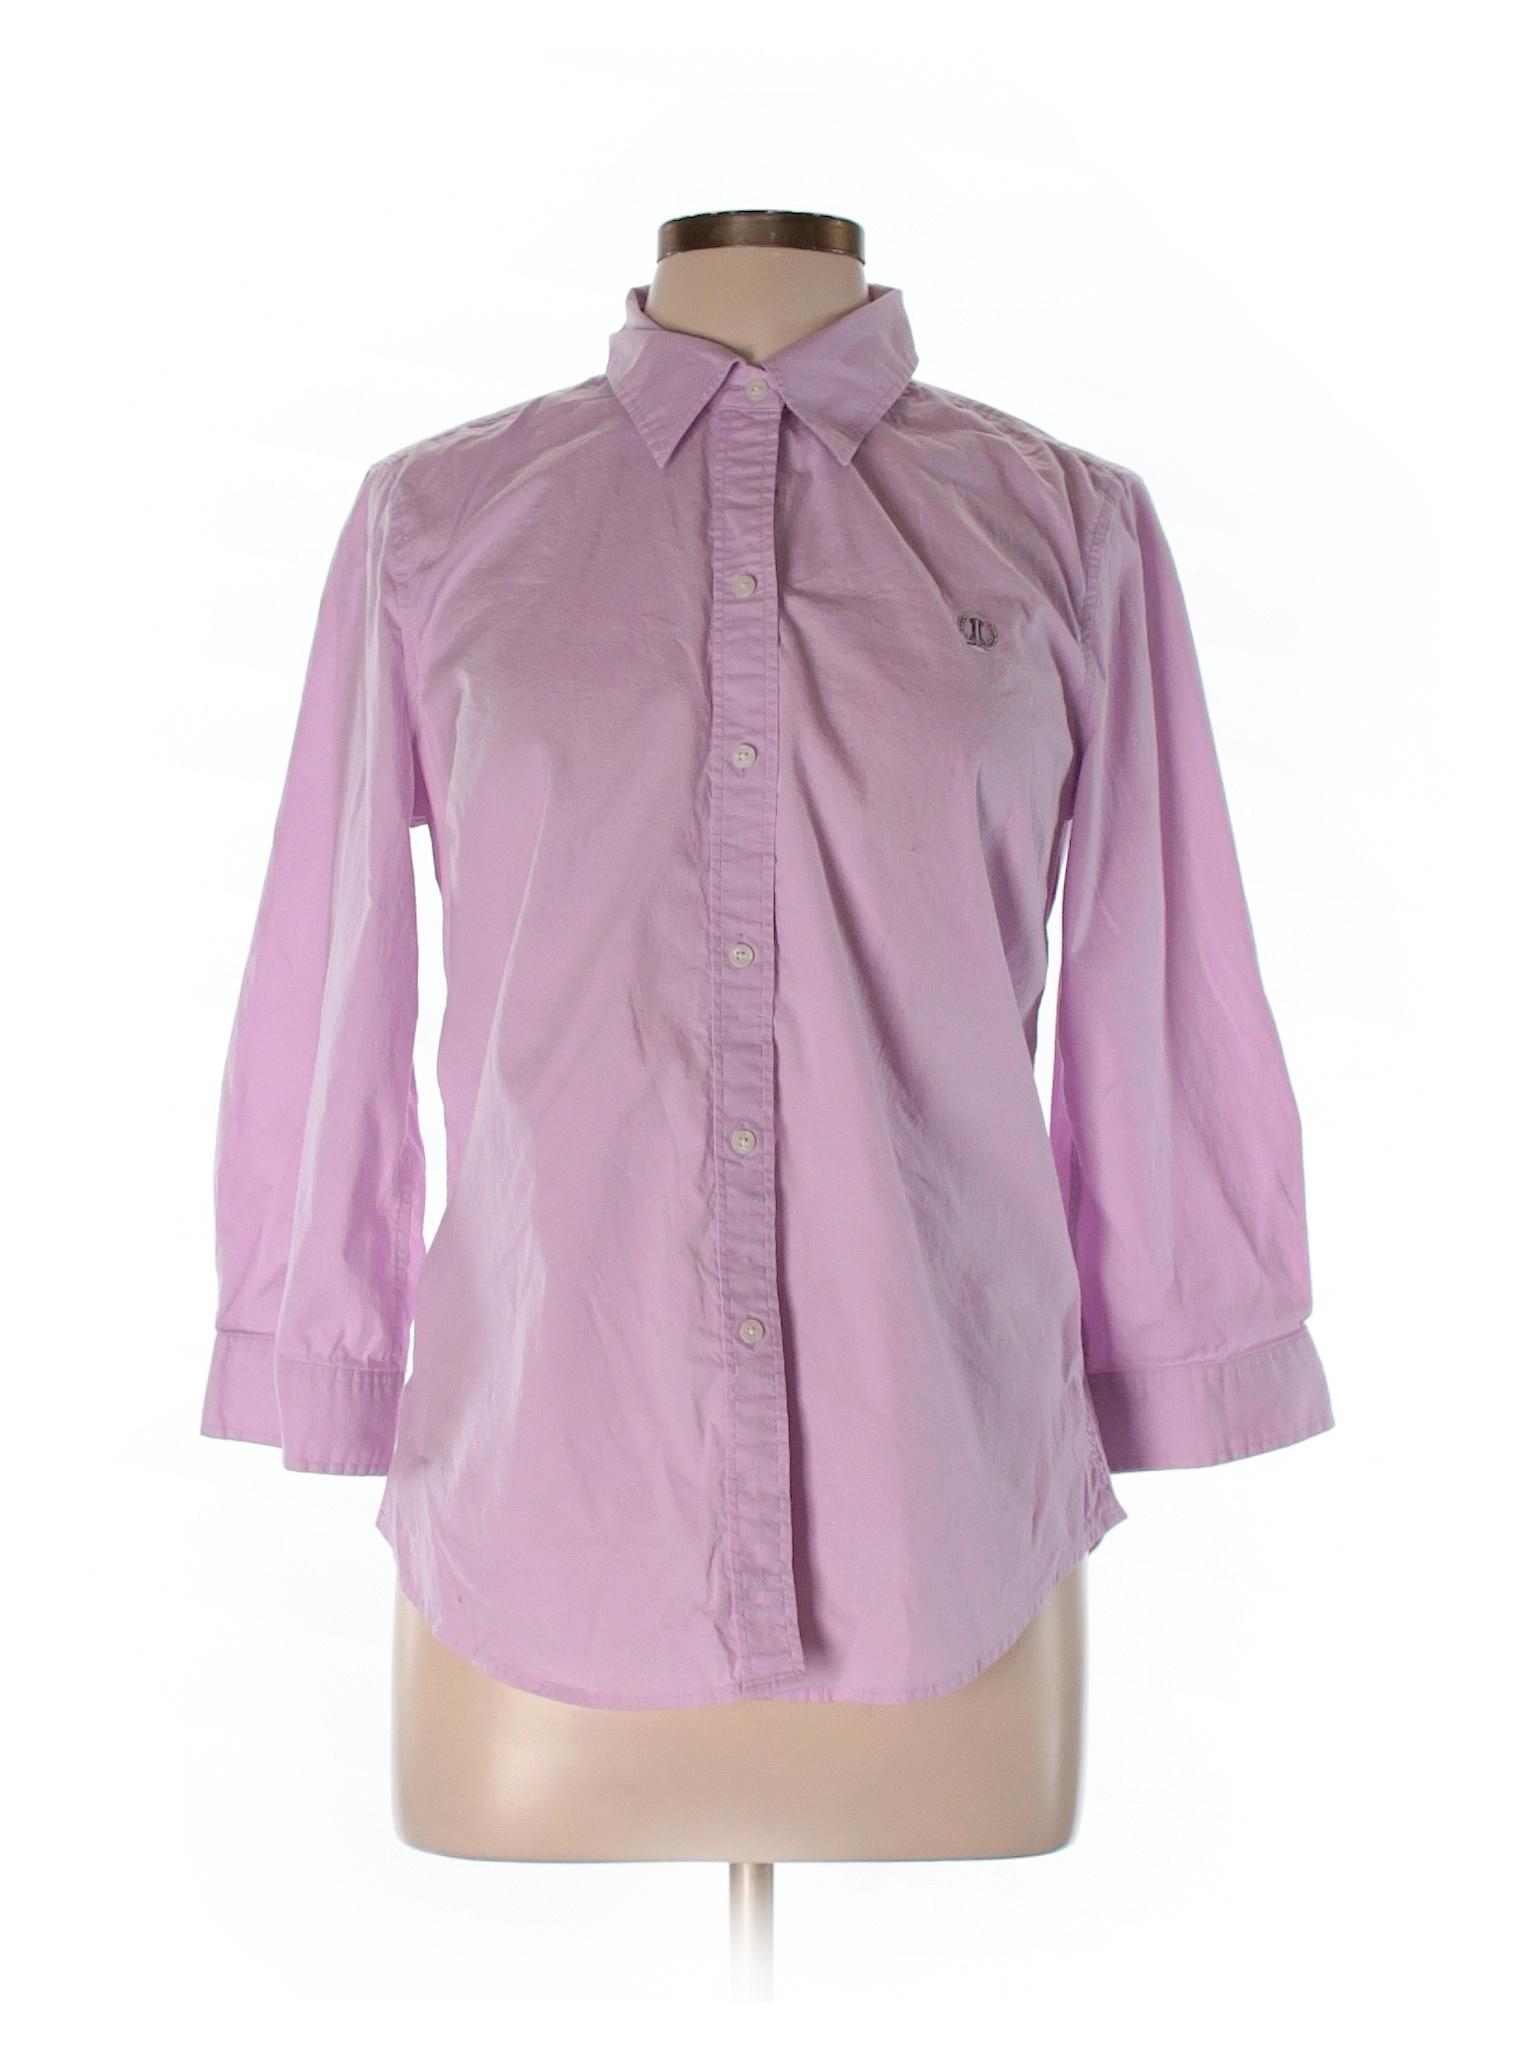 Izod Solid Light Purple 3 4 Sleeve Button Down Shirt Size